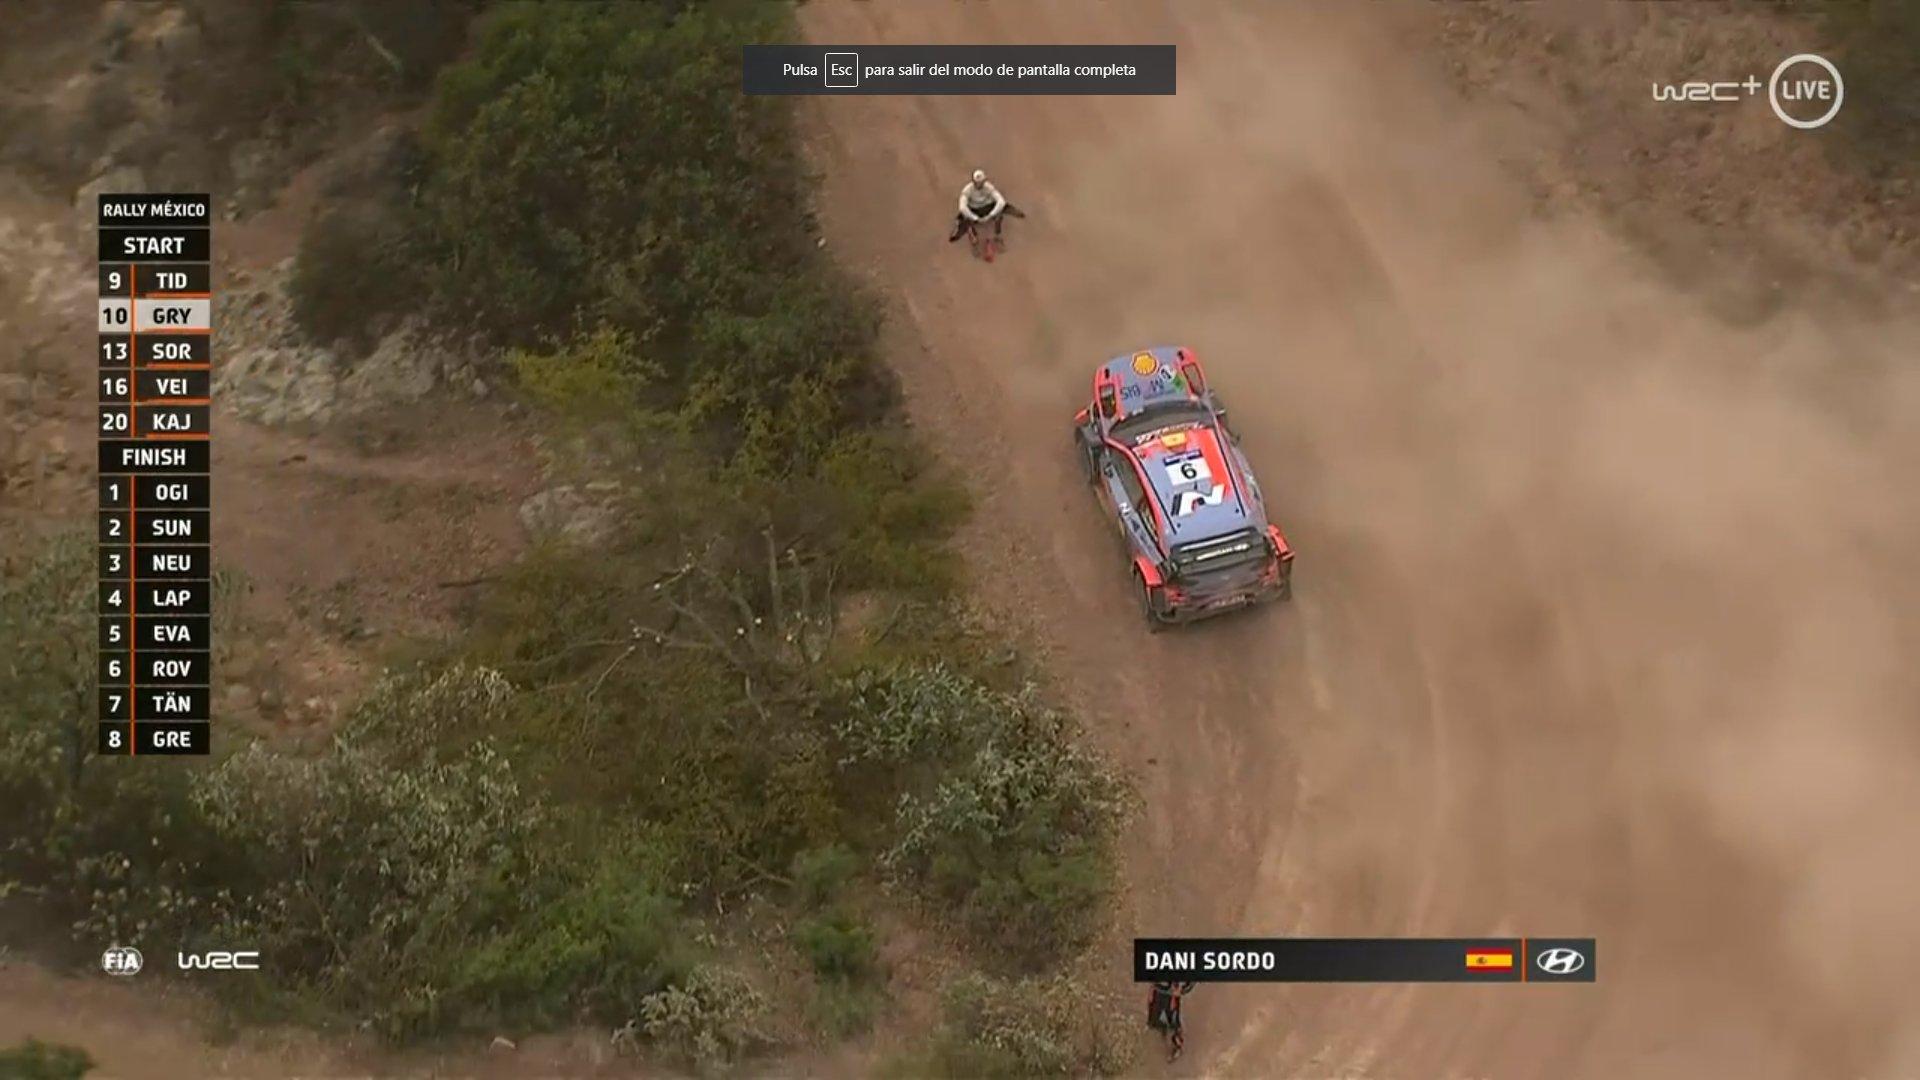 WRC: 17º Rallye Guanajuato Corona - México [12-15 Marzo] - Página 4 ETBhOTcX0AEDE6g?format=jpg&name=large